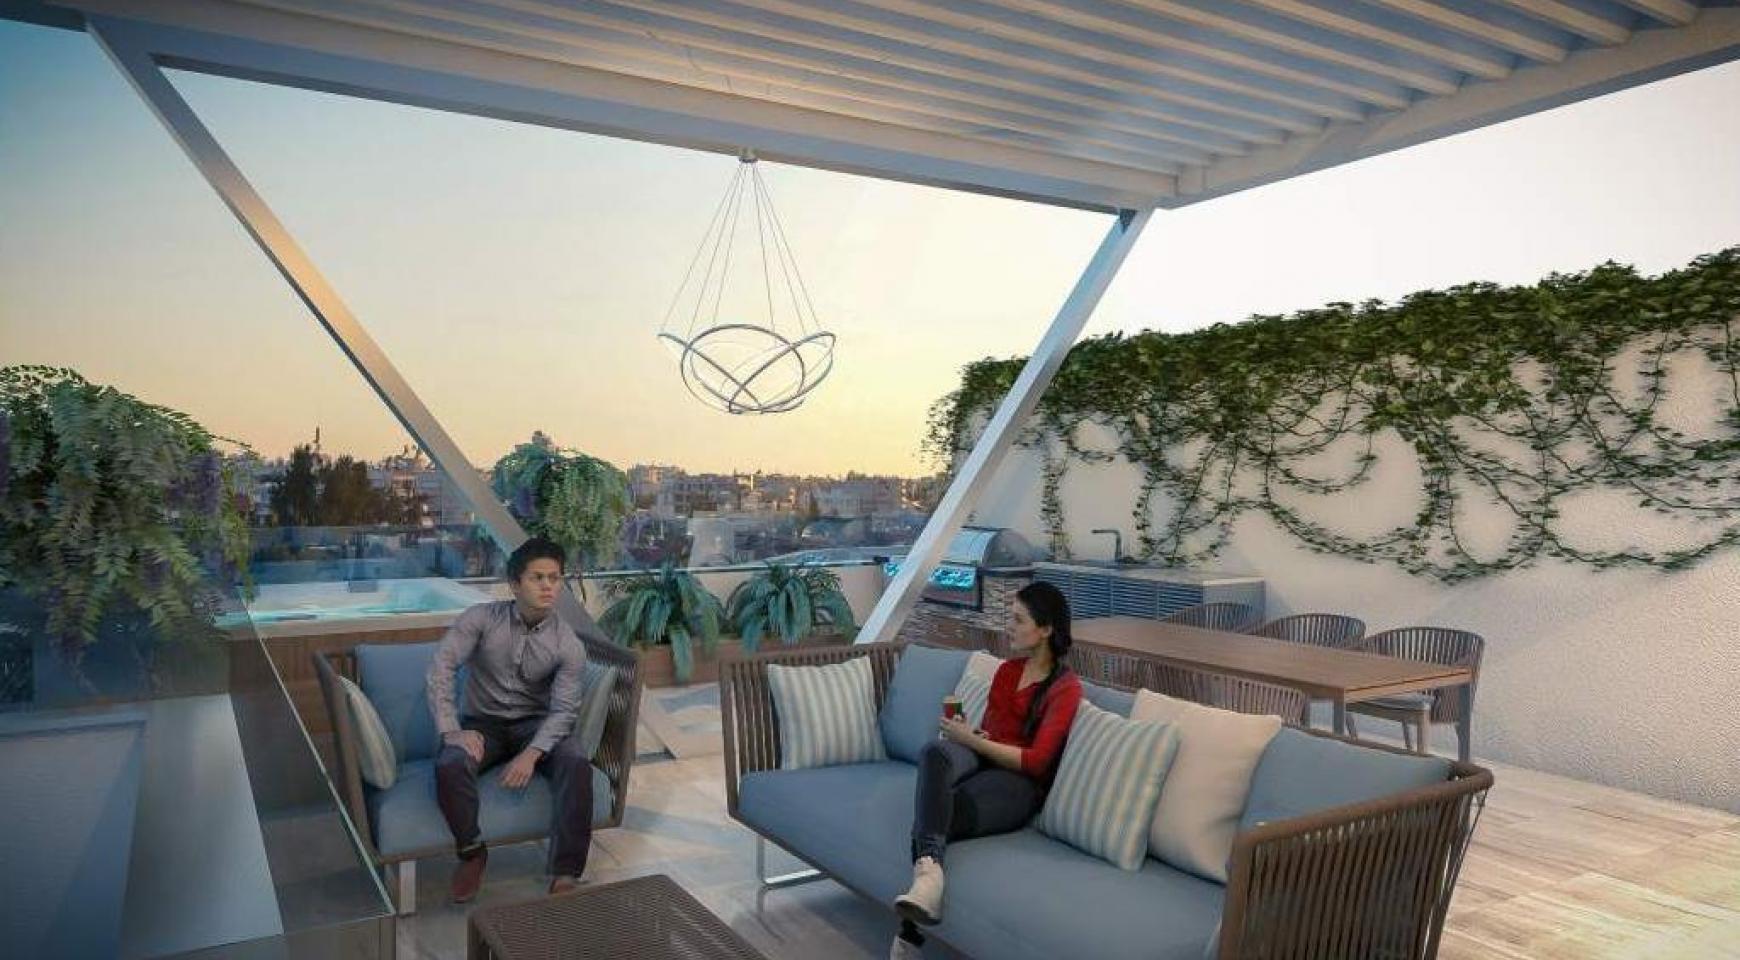 New 3 Bedroom Apartment in a Contemporary Complex near the Sea - 9